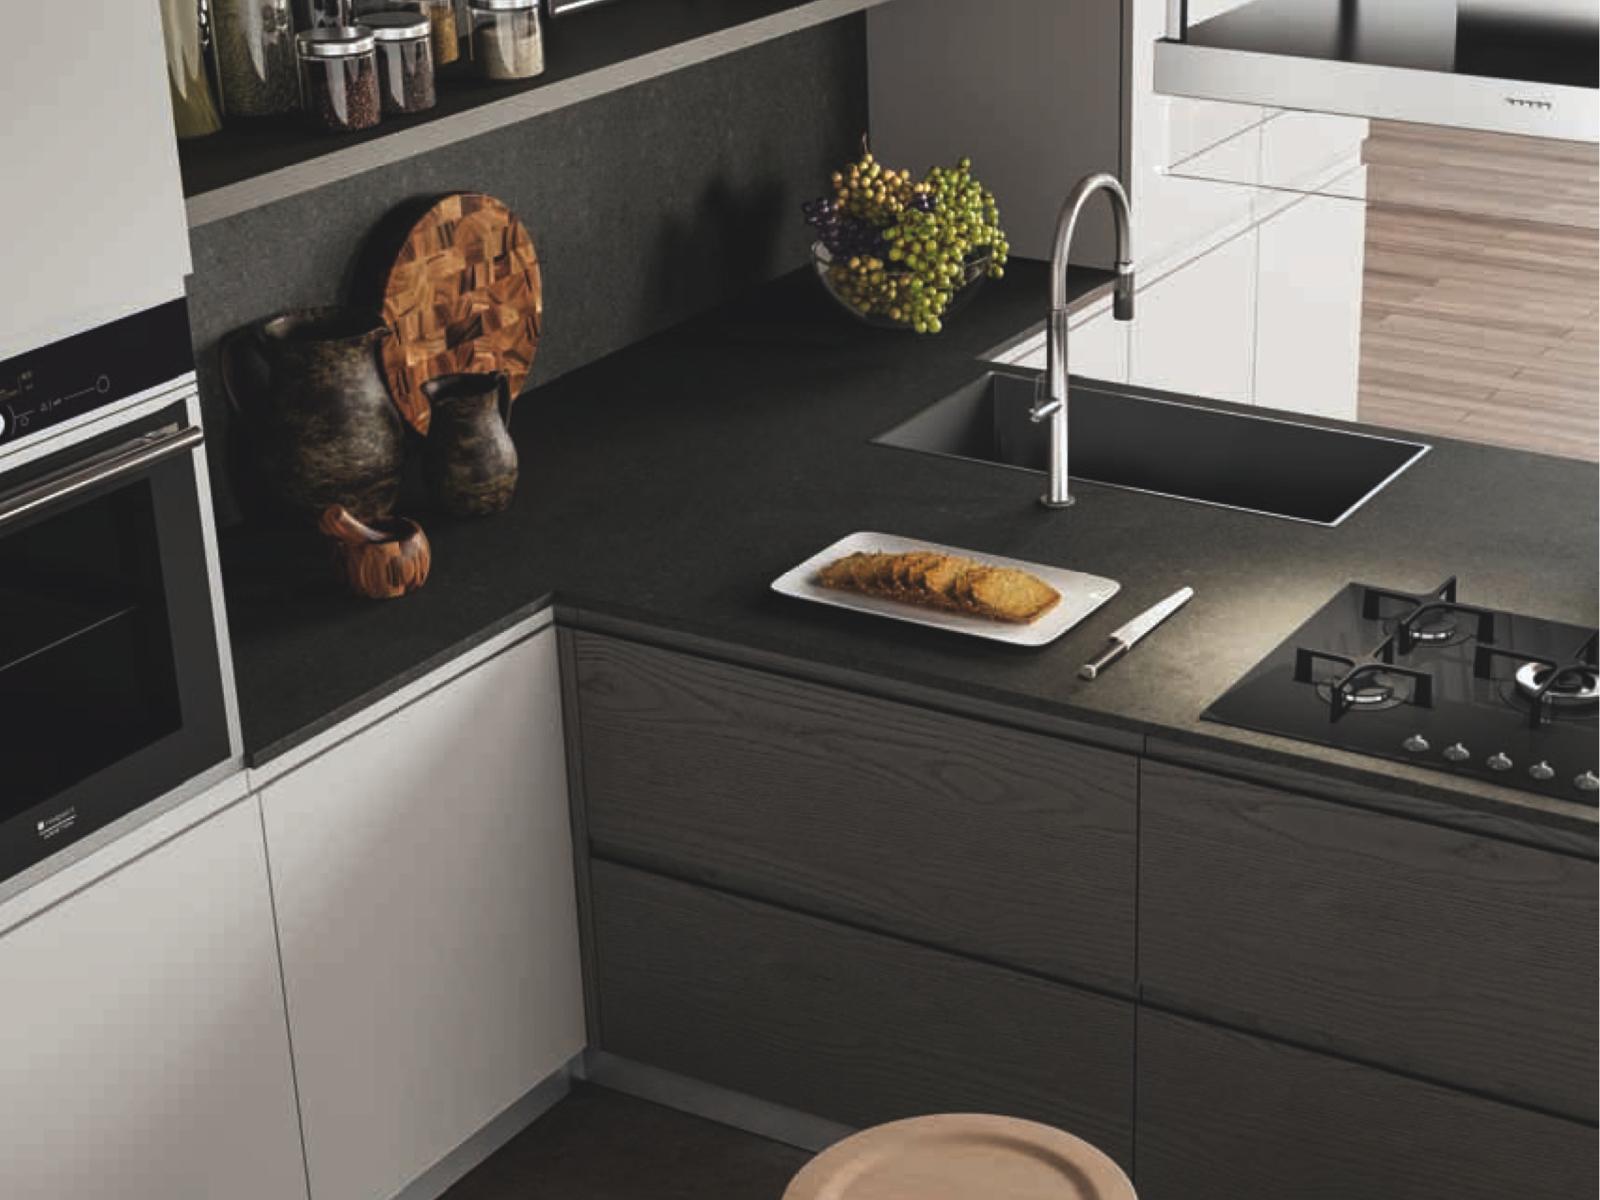 Top Cucina In Quarzo Corian O Ceramica Ti Aiutiamo A Scegliere Blog Outlet Arreda Arredamento E Casa